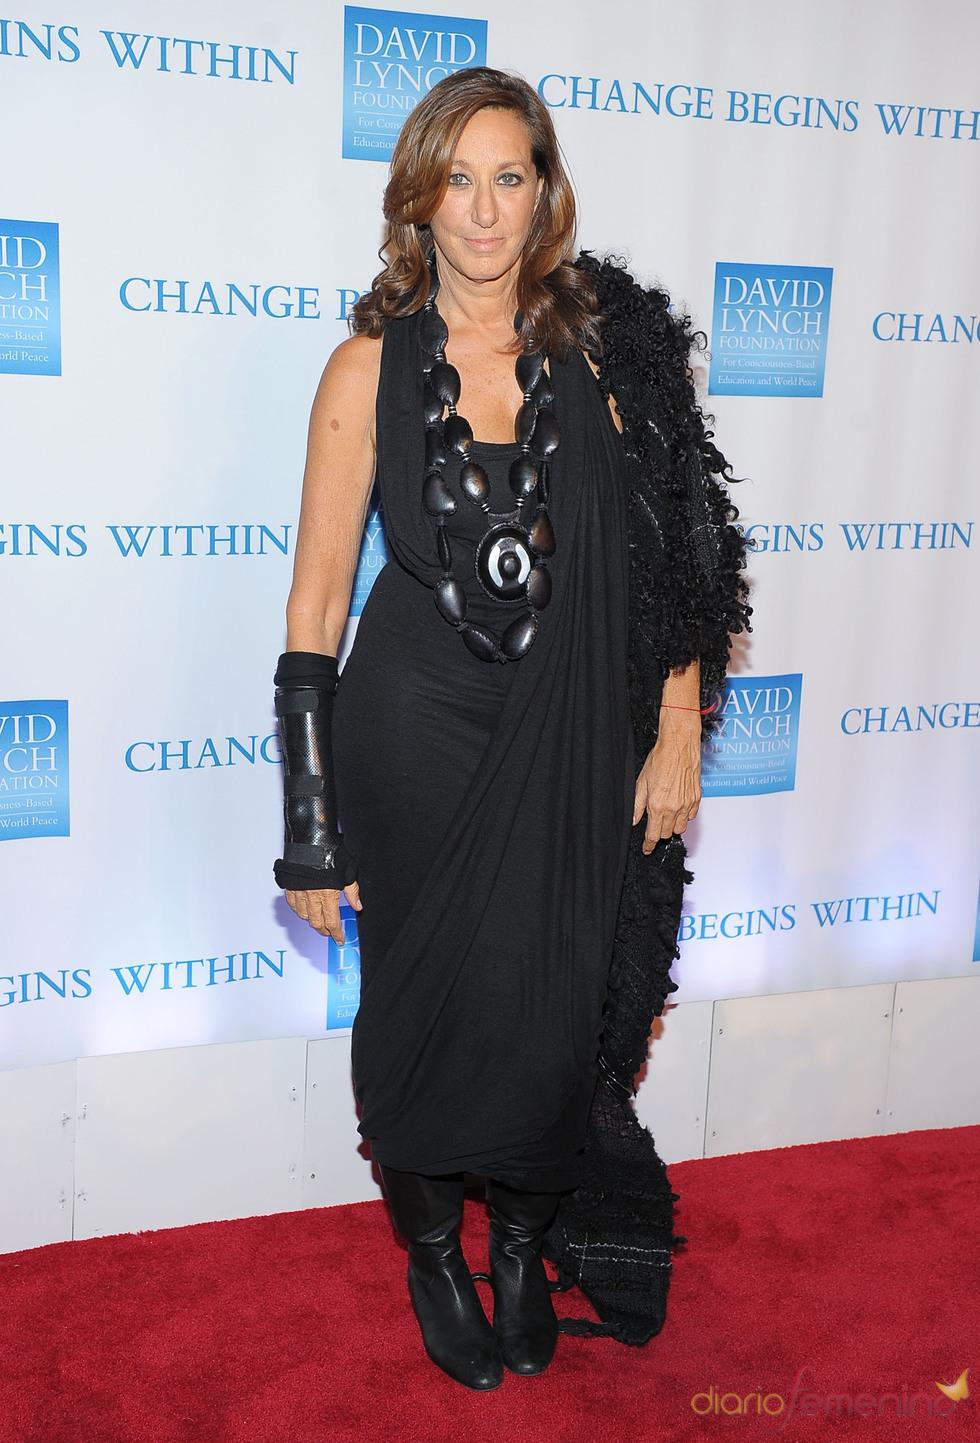 Donna Karan en la gala benéfica 2010 de David Lynch